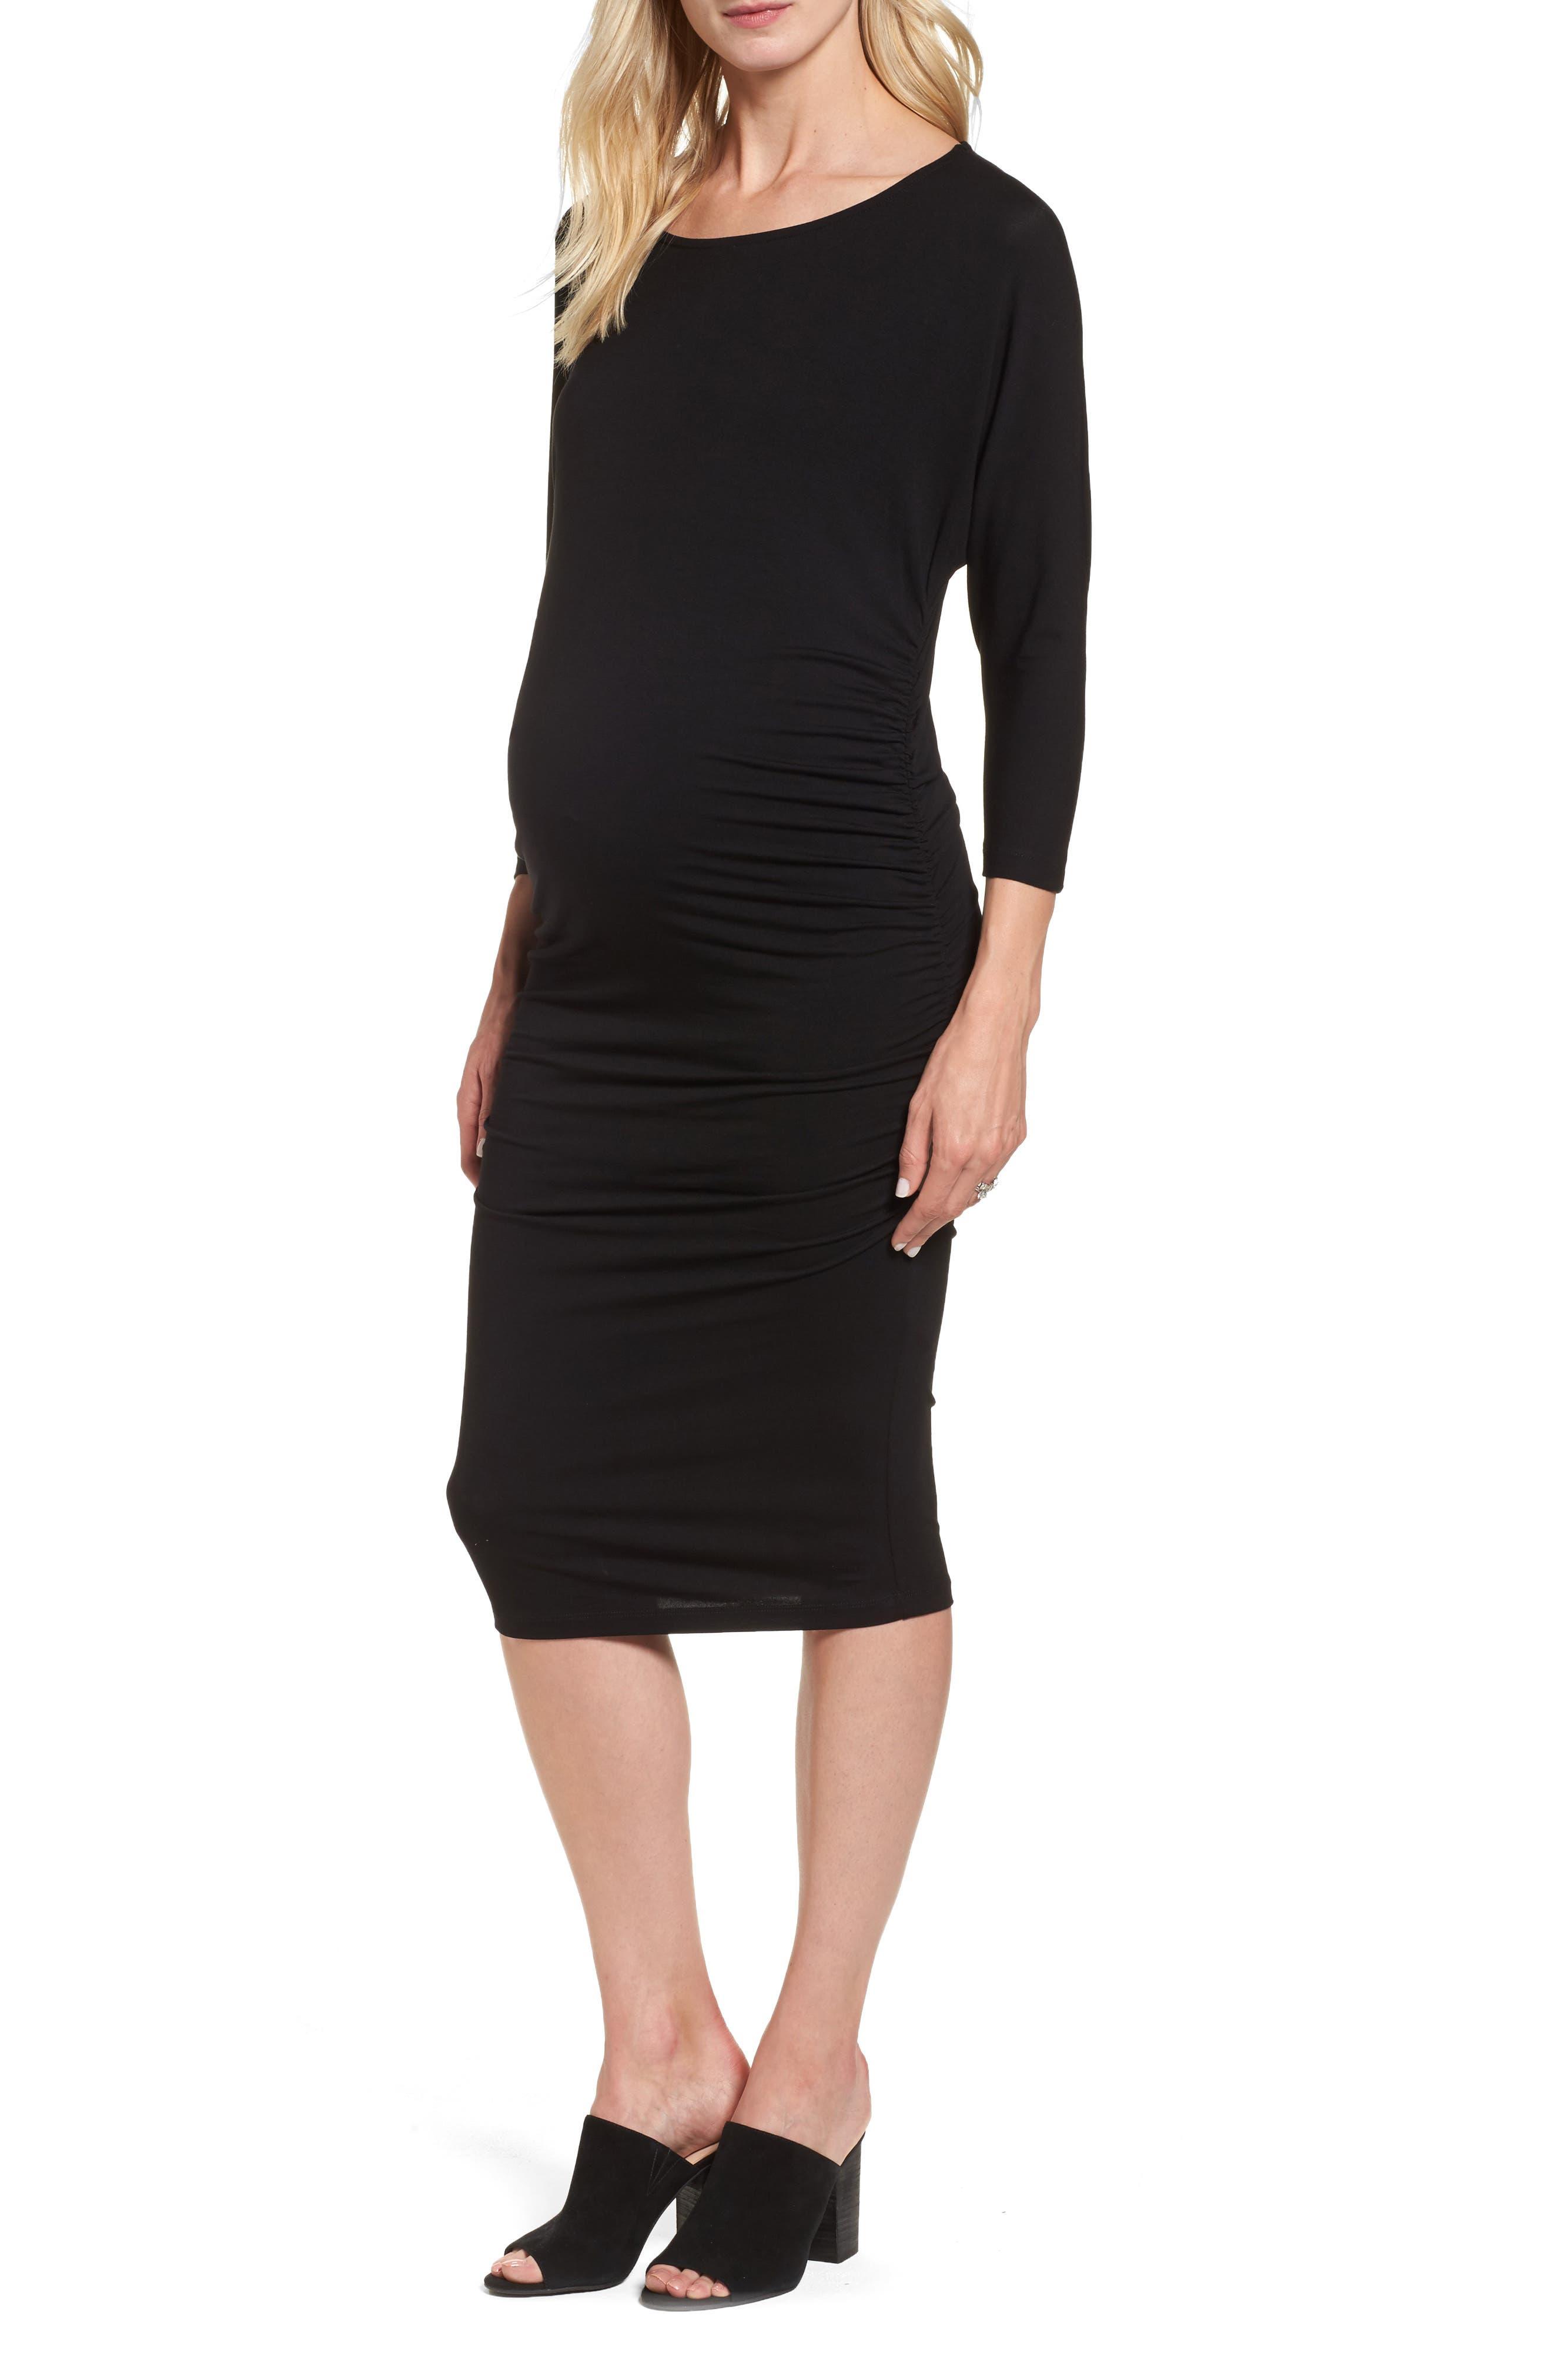 Jessa Maternity Dress,                             Main thumbnail 1, color,                             Caviar Black